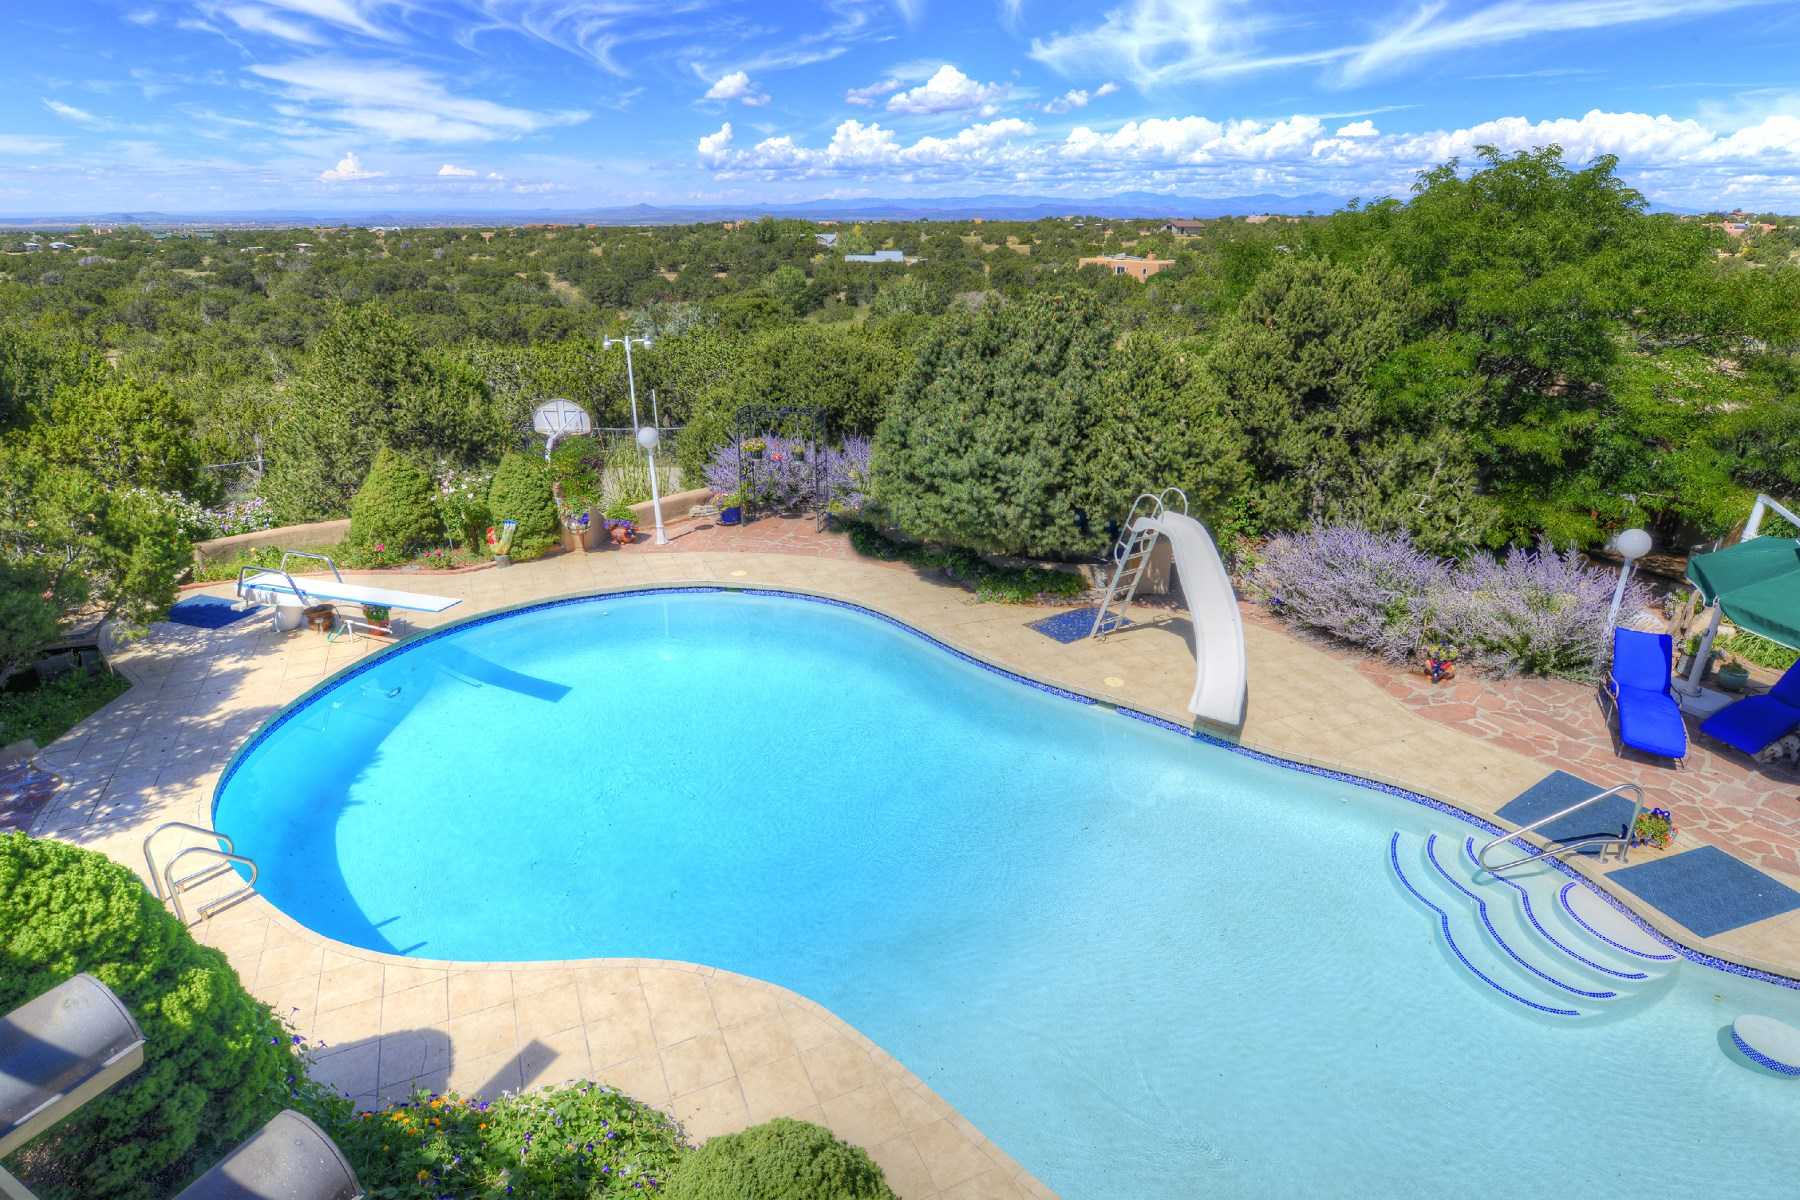 Single Family Home for Sale at 161 Arroyo Hondo Road Santa Fe, New Mexico, 87508 United States